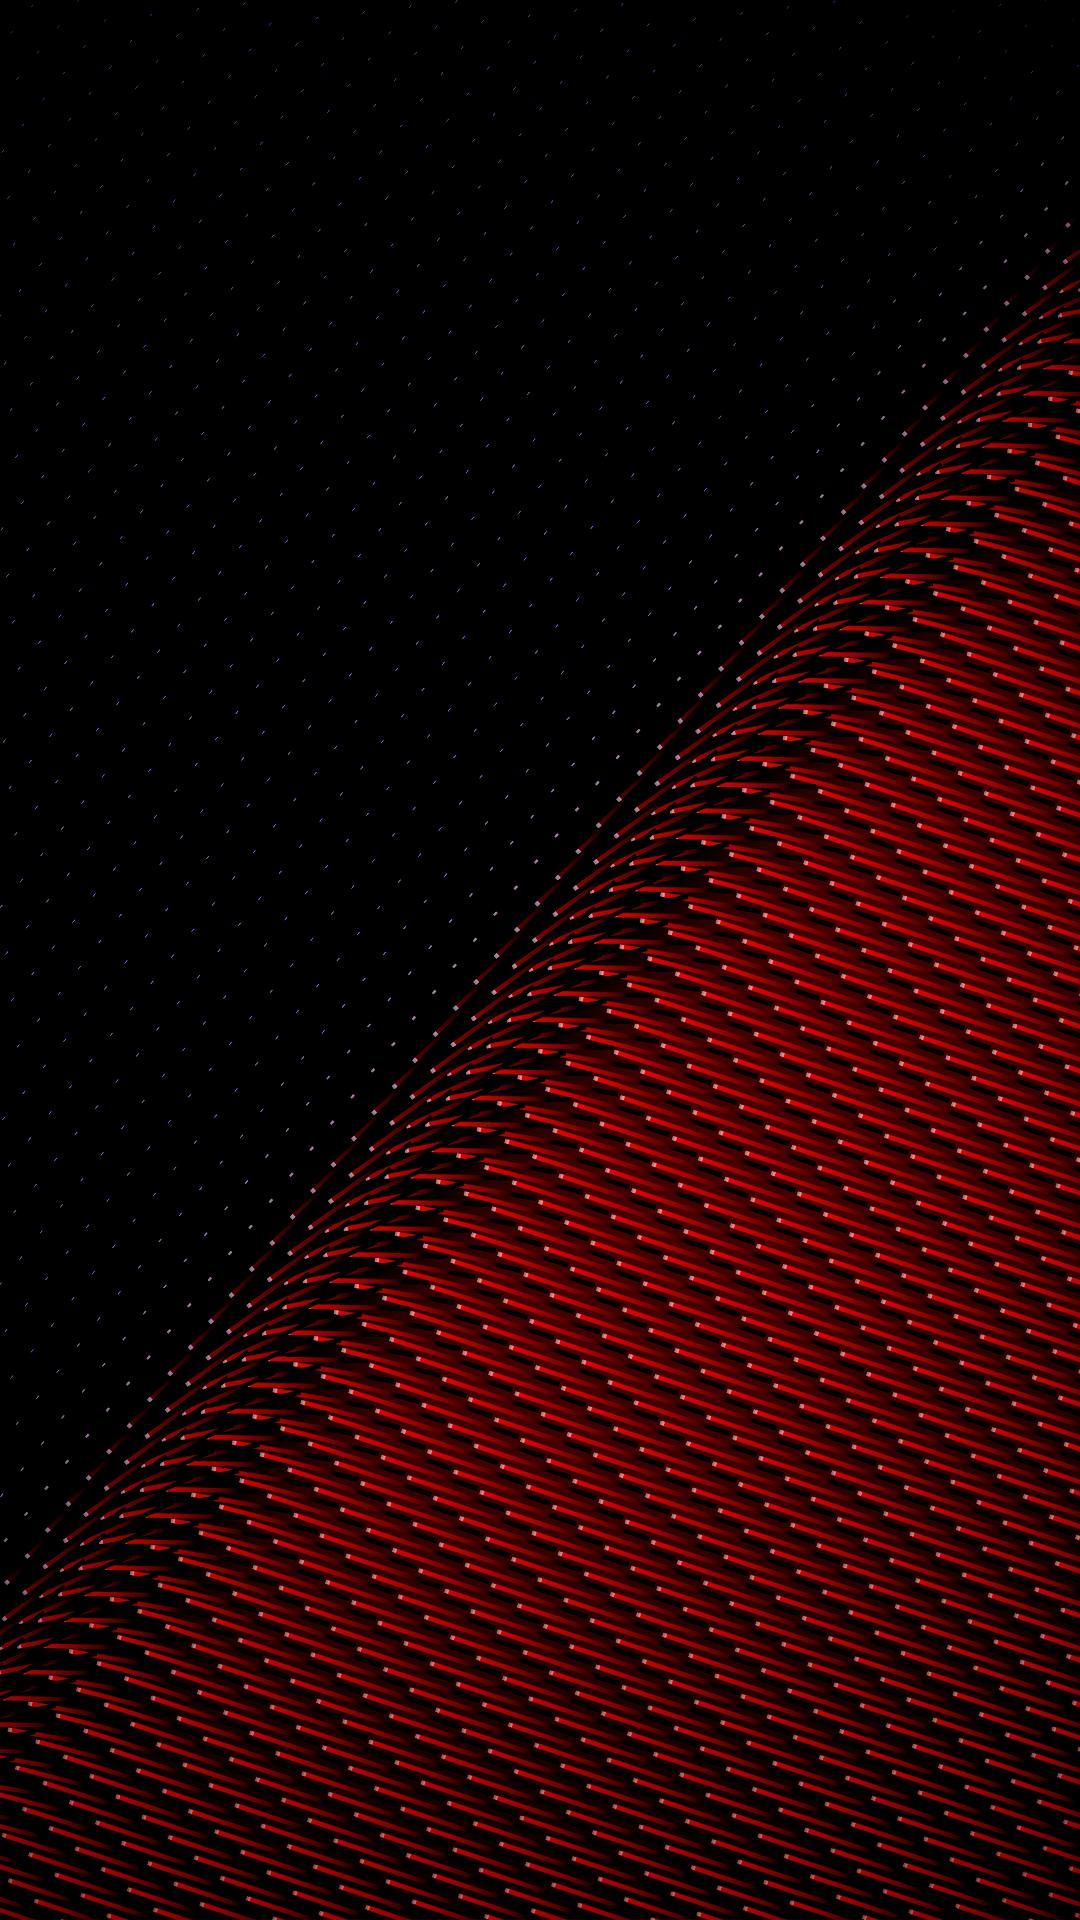 Fondos De Pantalla Potrait Fondo Negro Abstracto Amoled